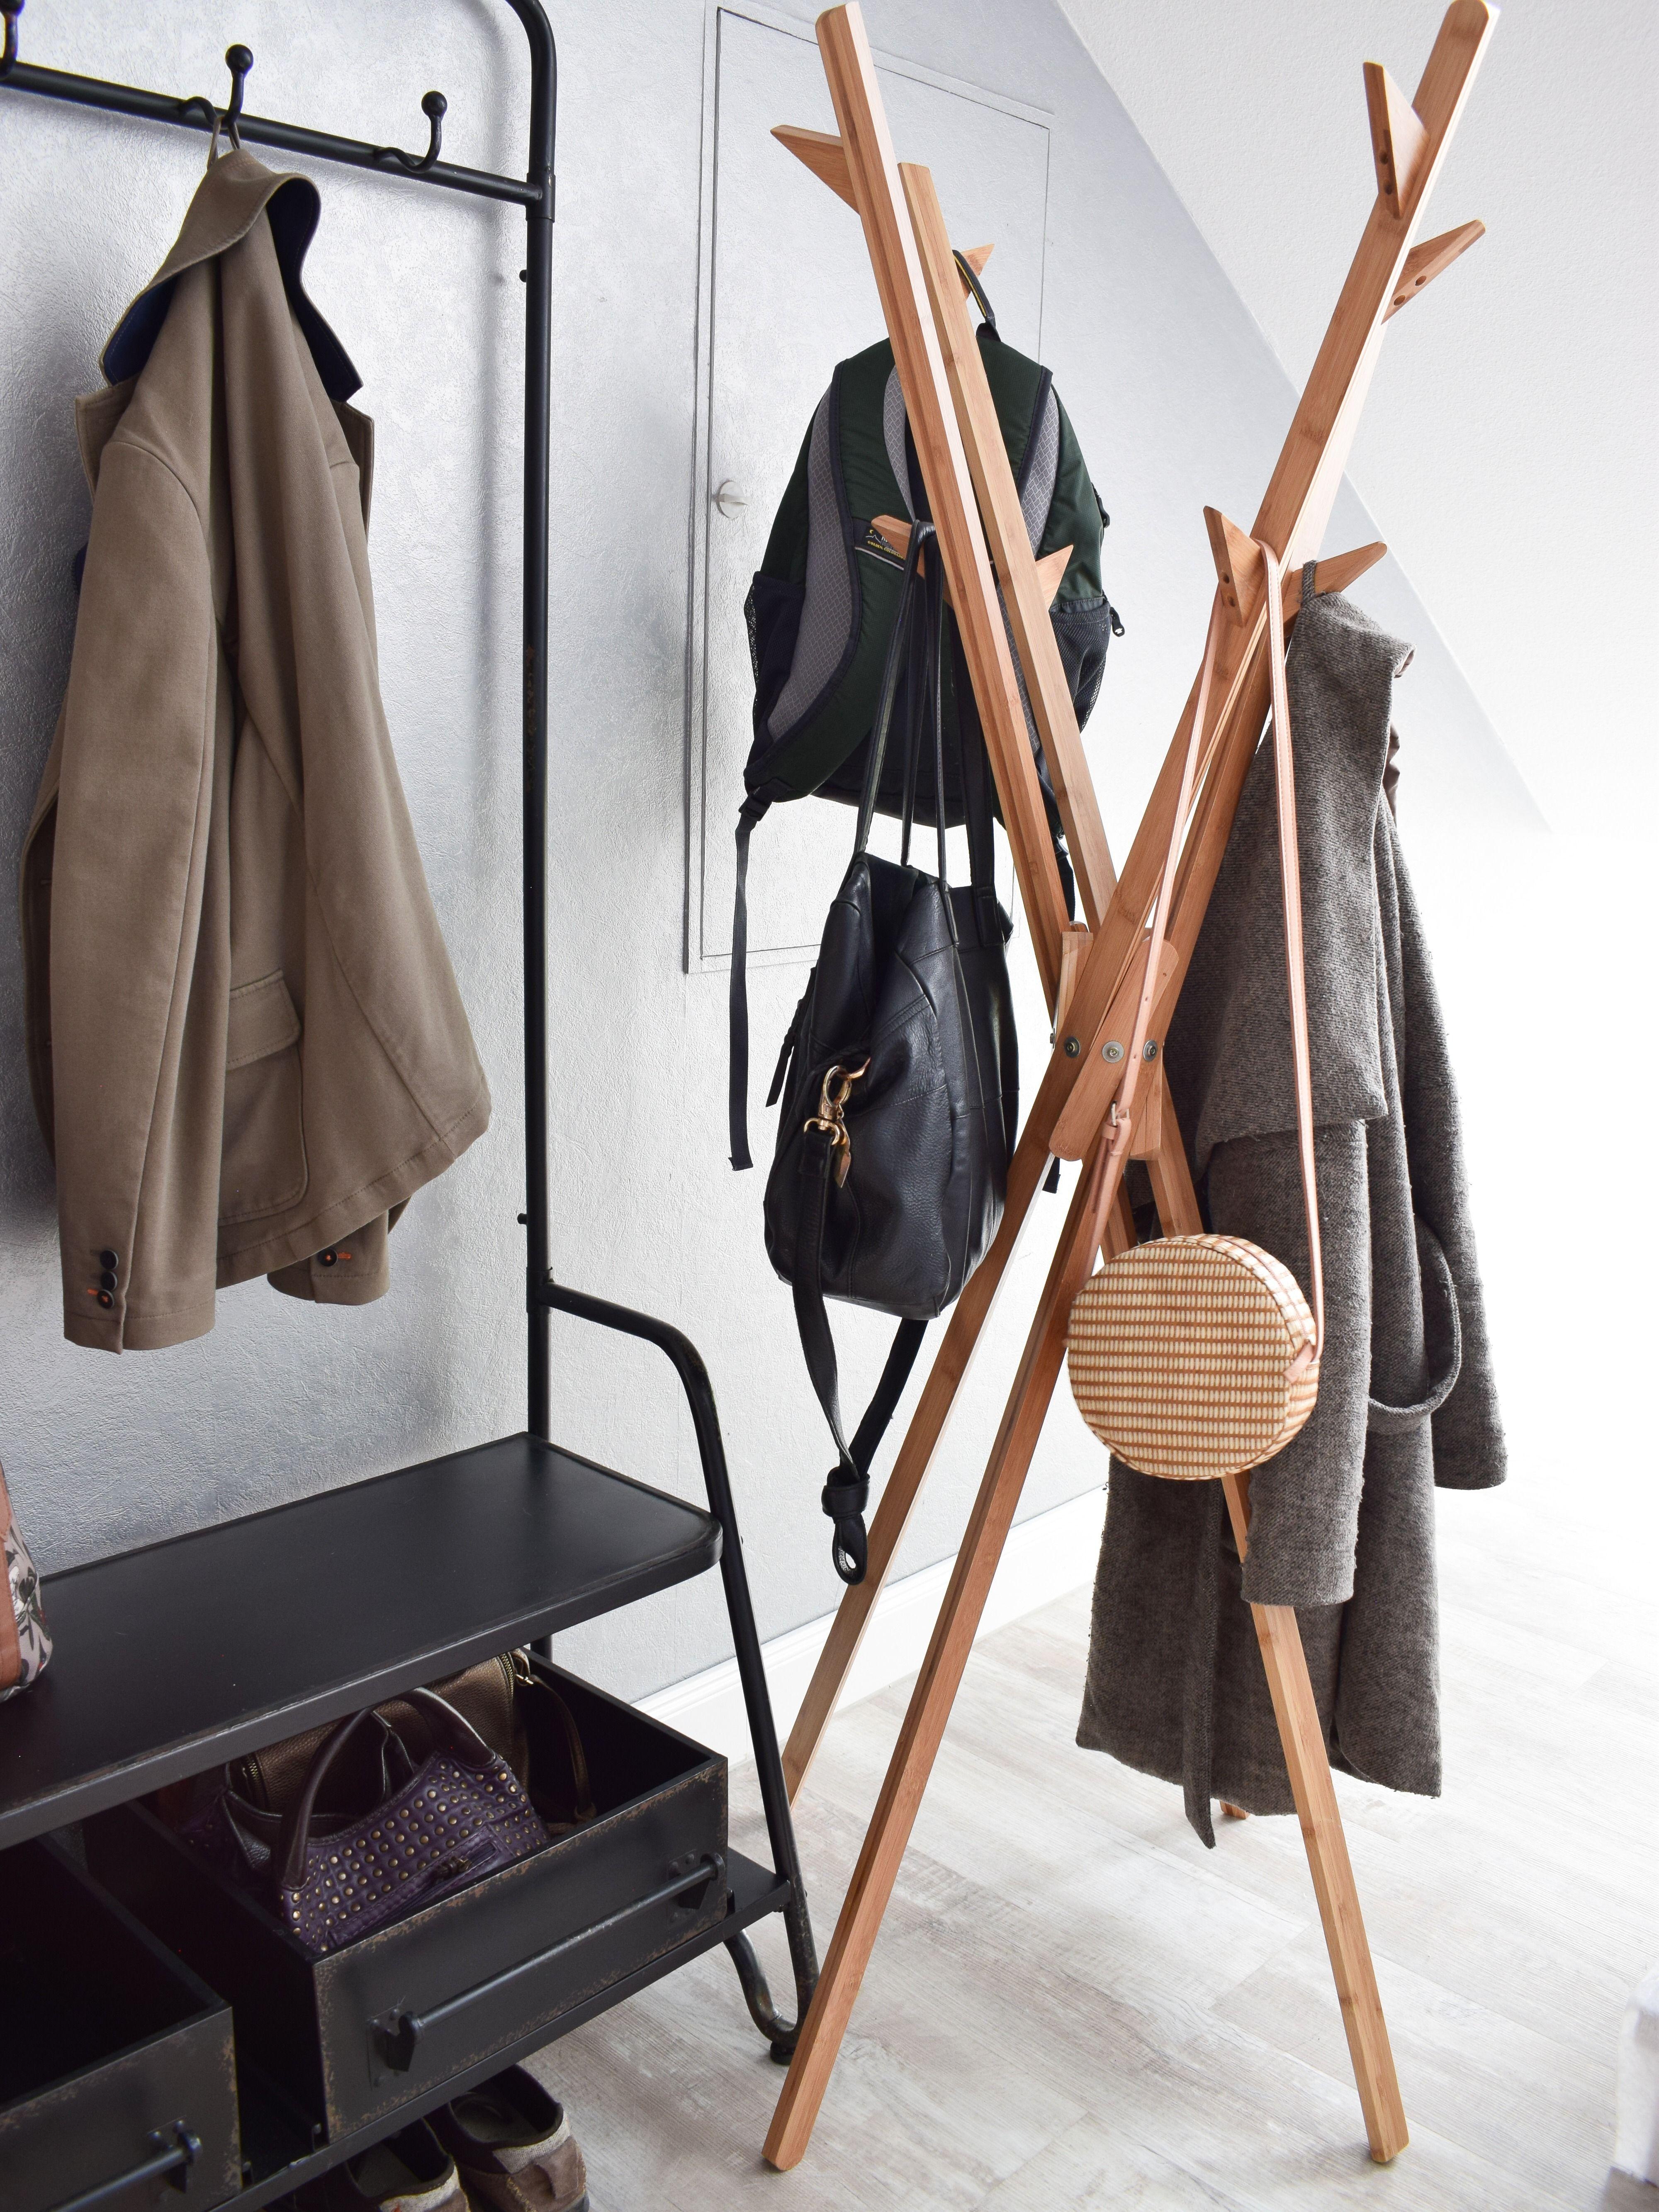 Standgarderobe Mikado Aus Bambus Garderobe Ideen Aufbewahrung